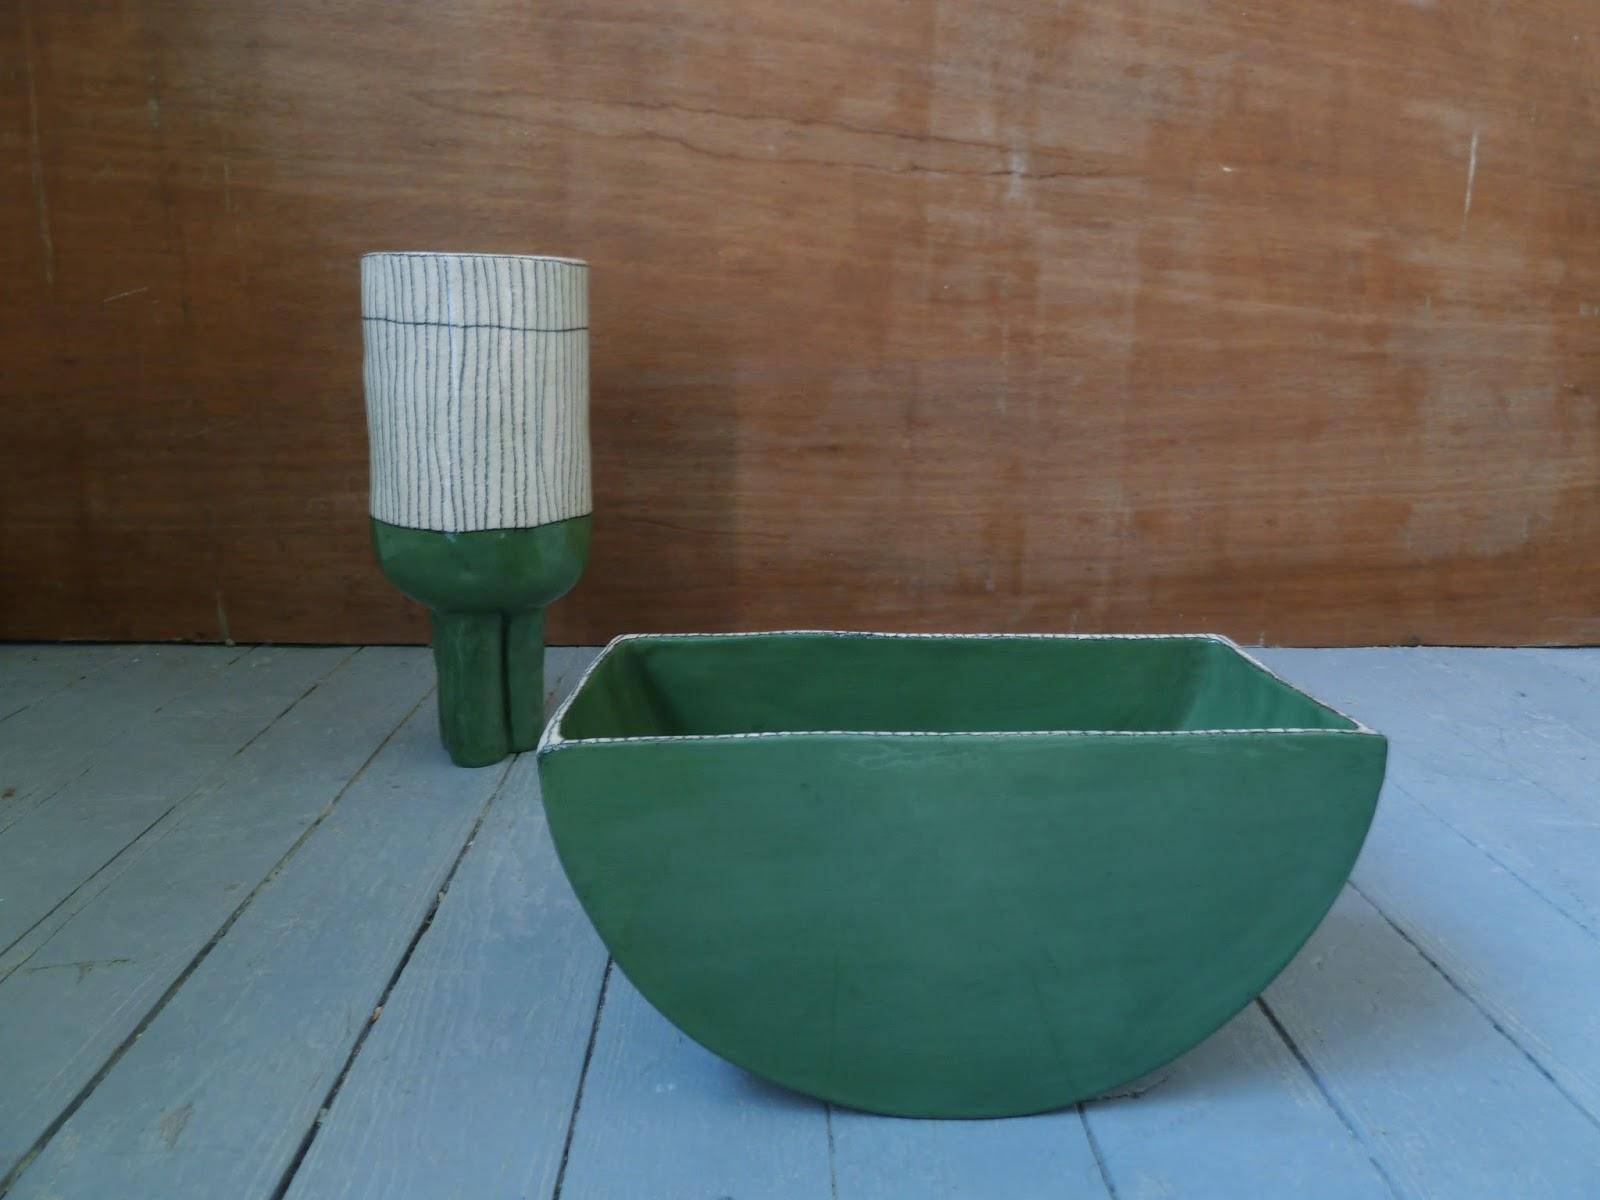 sabine orlandini design c ramique juin contenant bascule et vase tripode. Black Bedroom Furniture Sets. Home Design Ideas